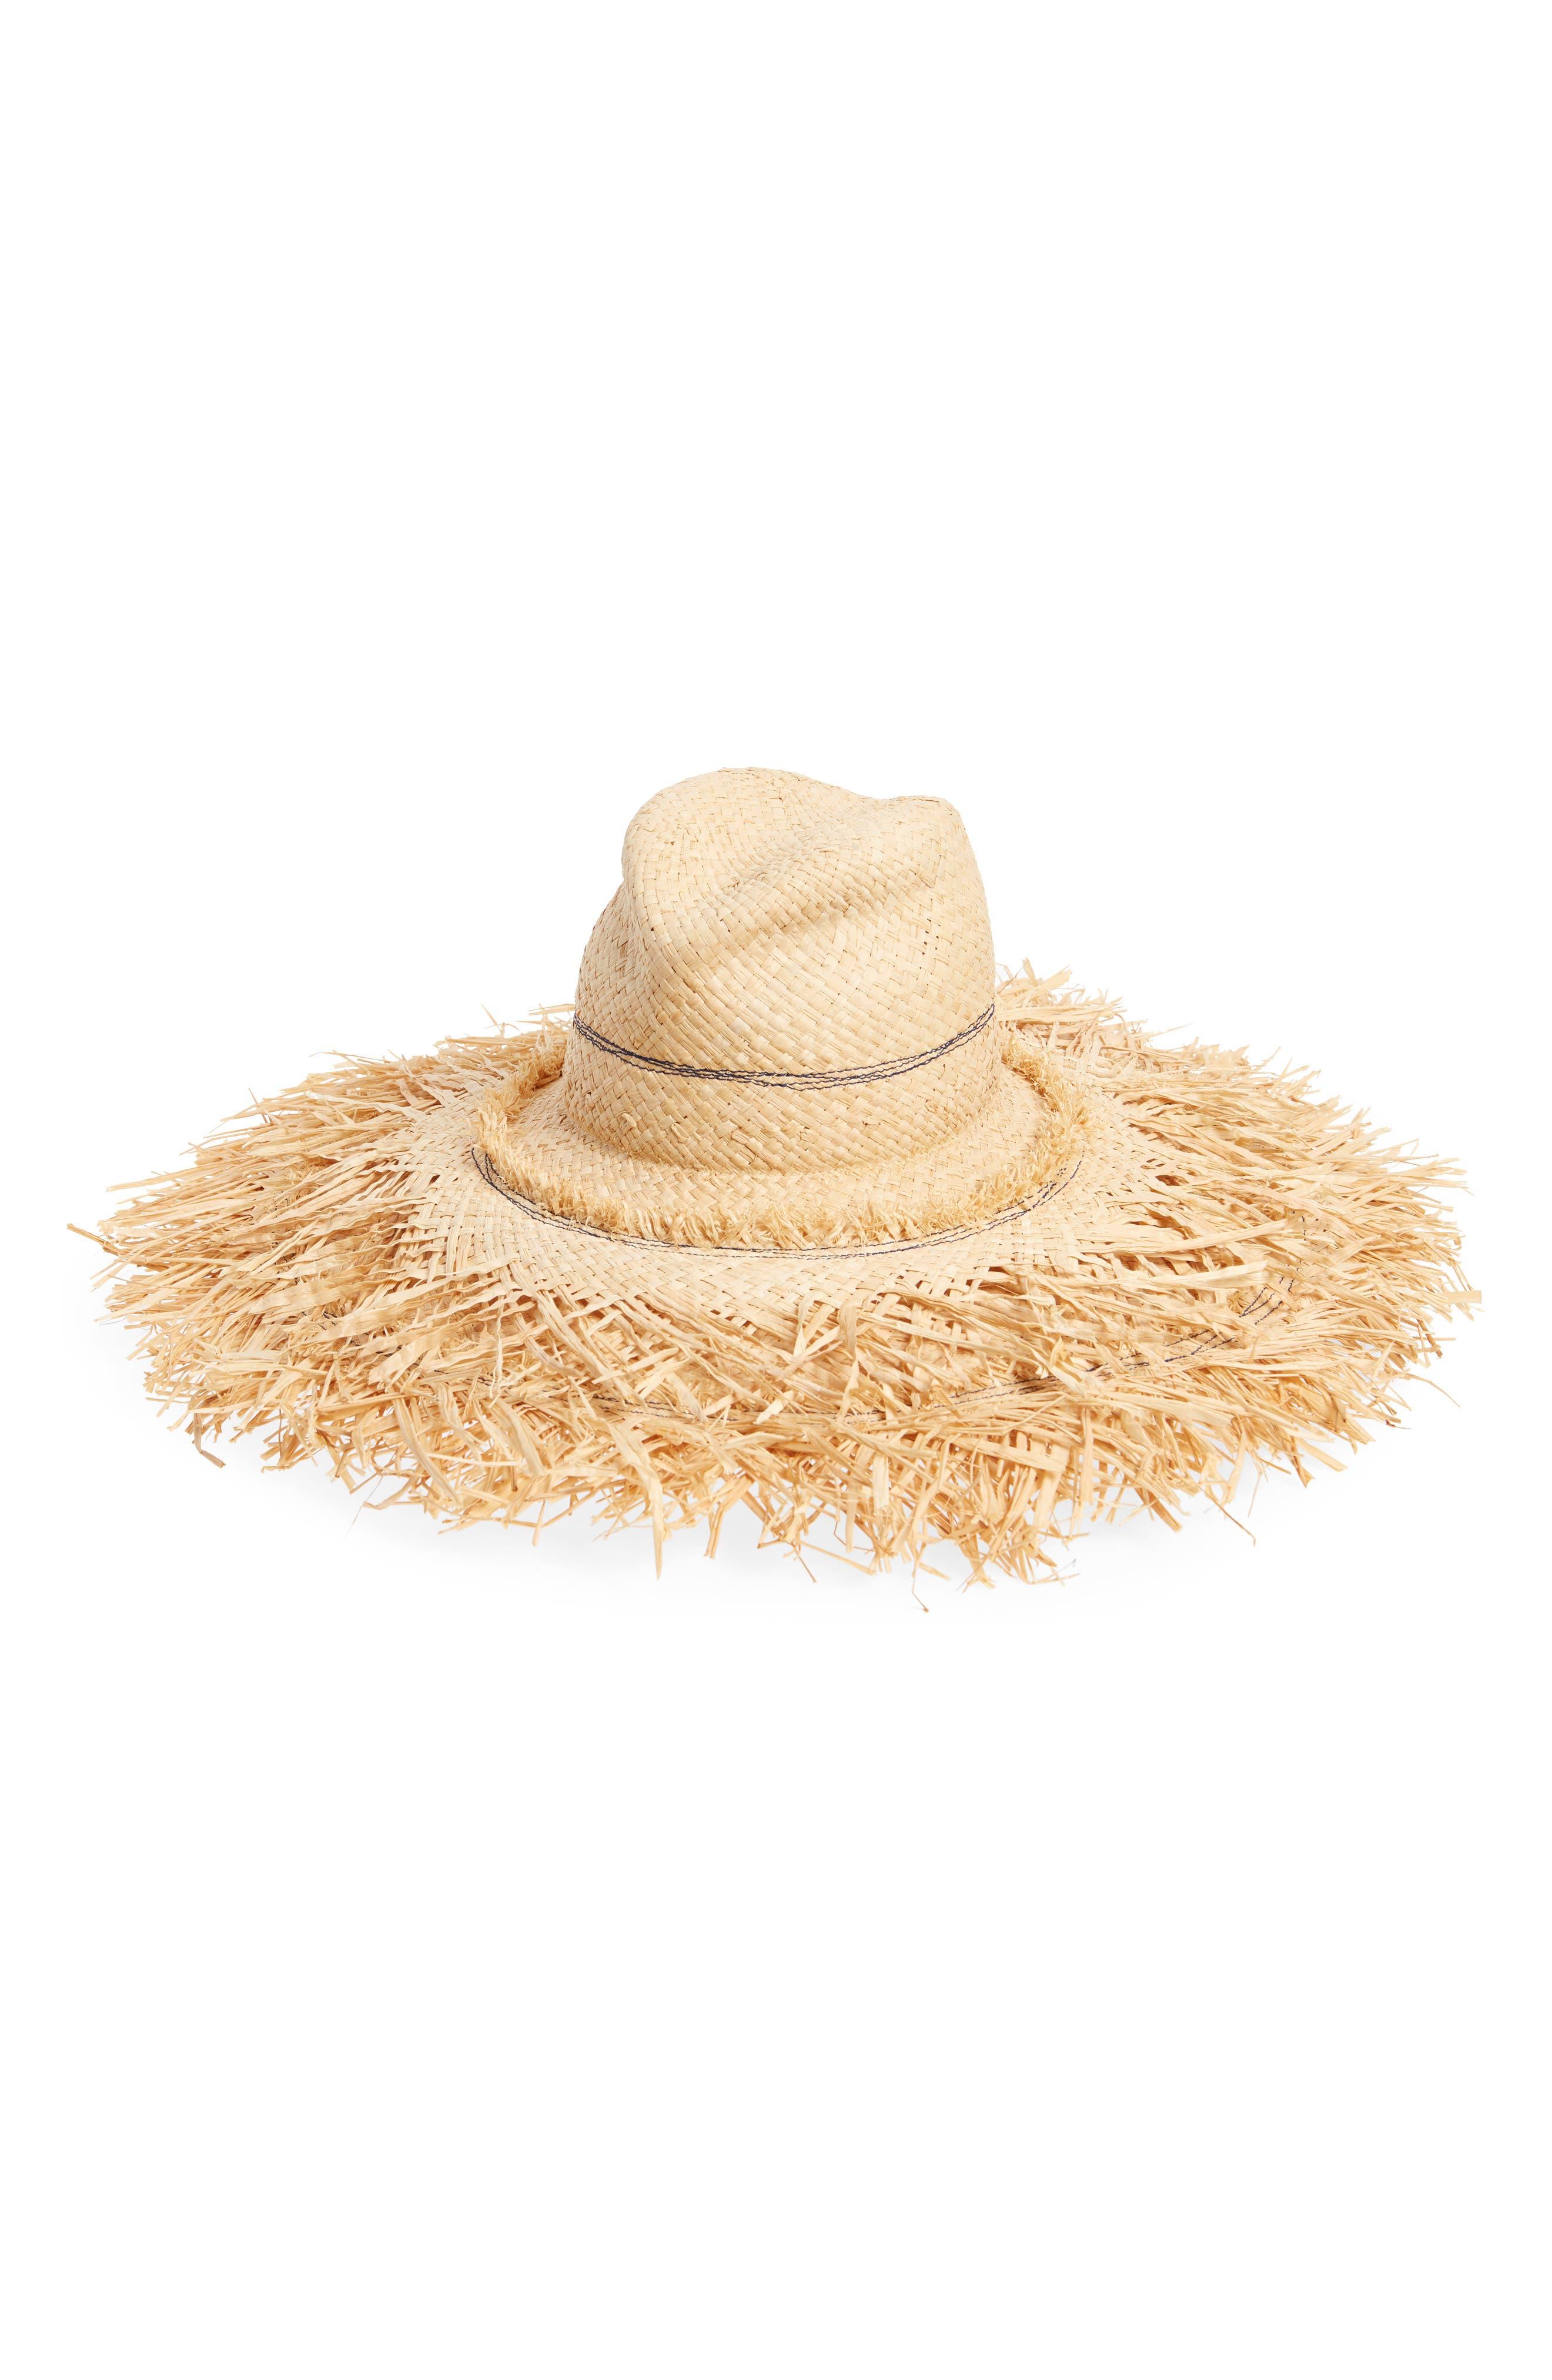 Coconut Raffia Sun Hat,                             Main thumbnail 1, color,                             410